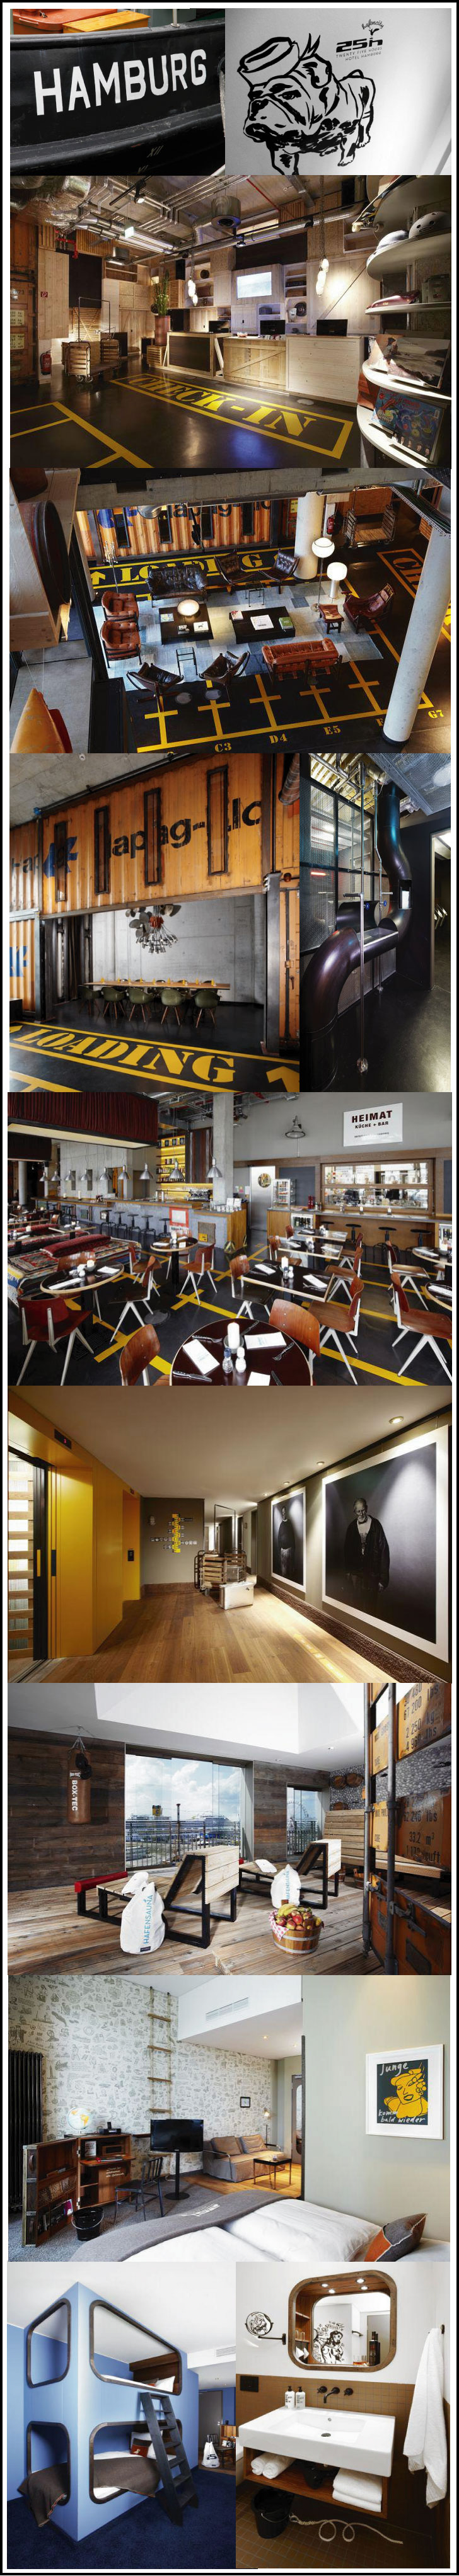 hafencity-hotel-hambourg deco marine et industrielle